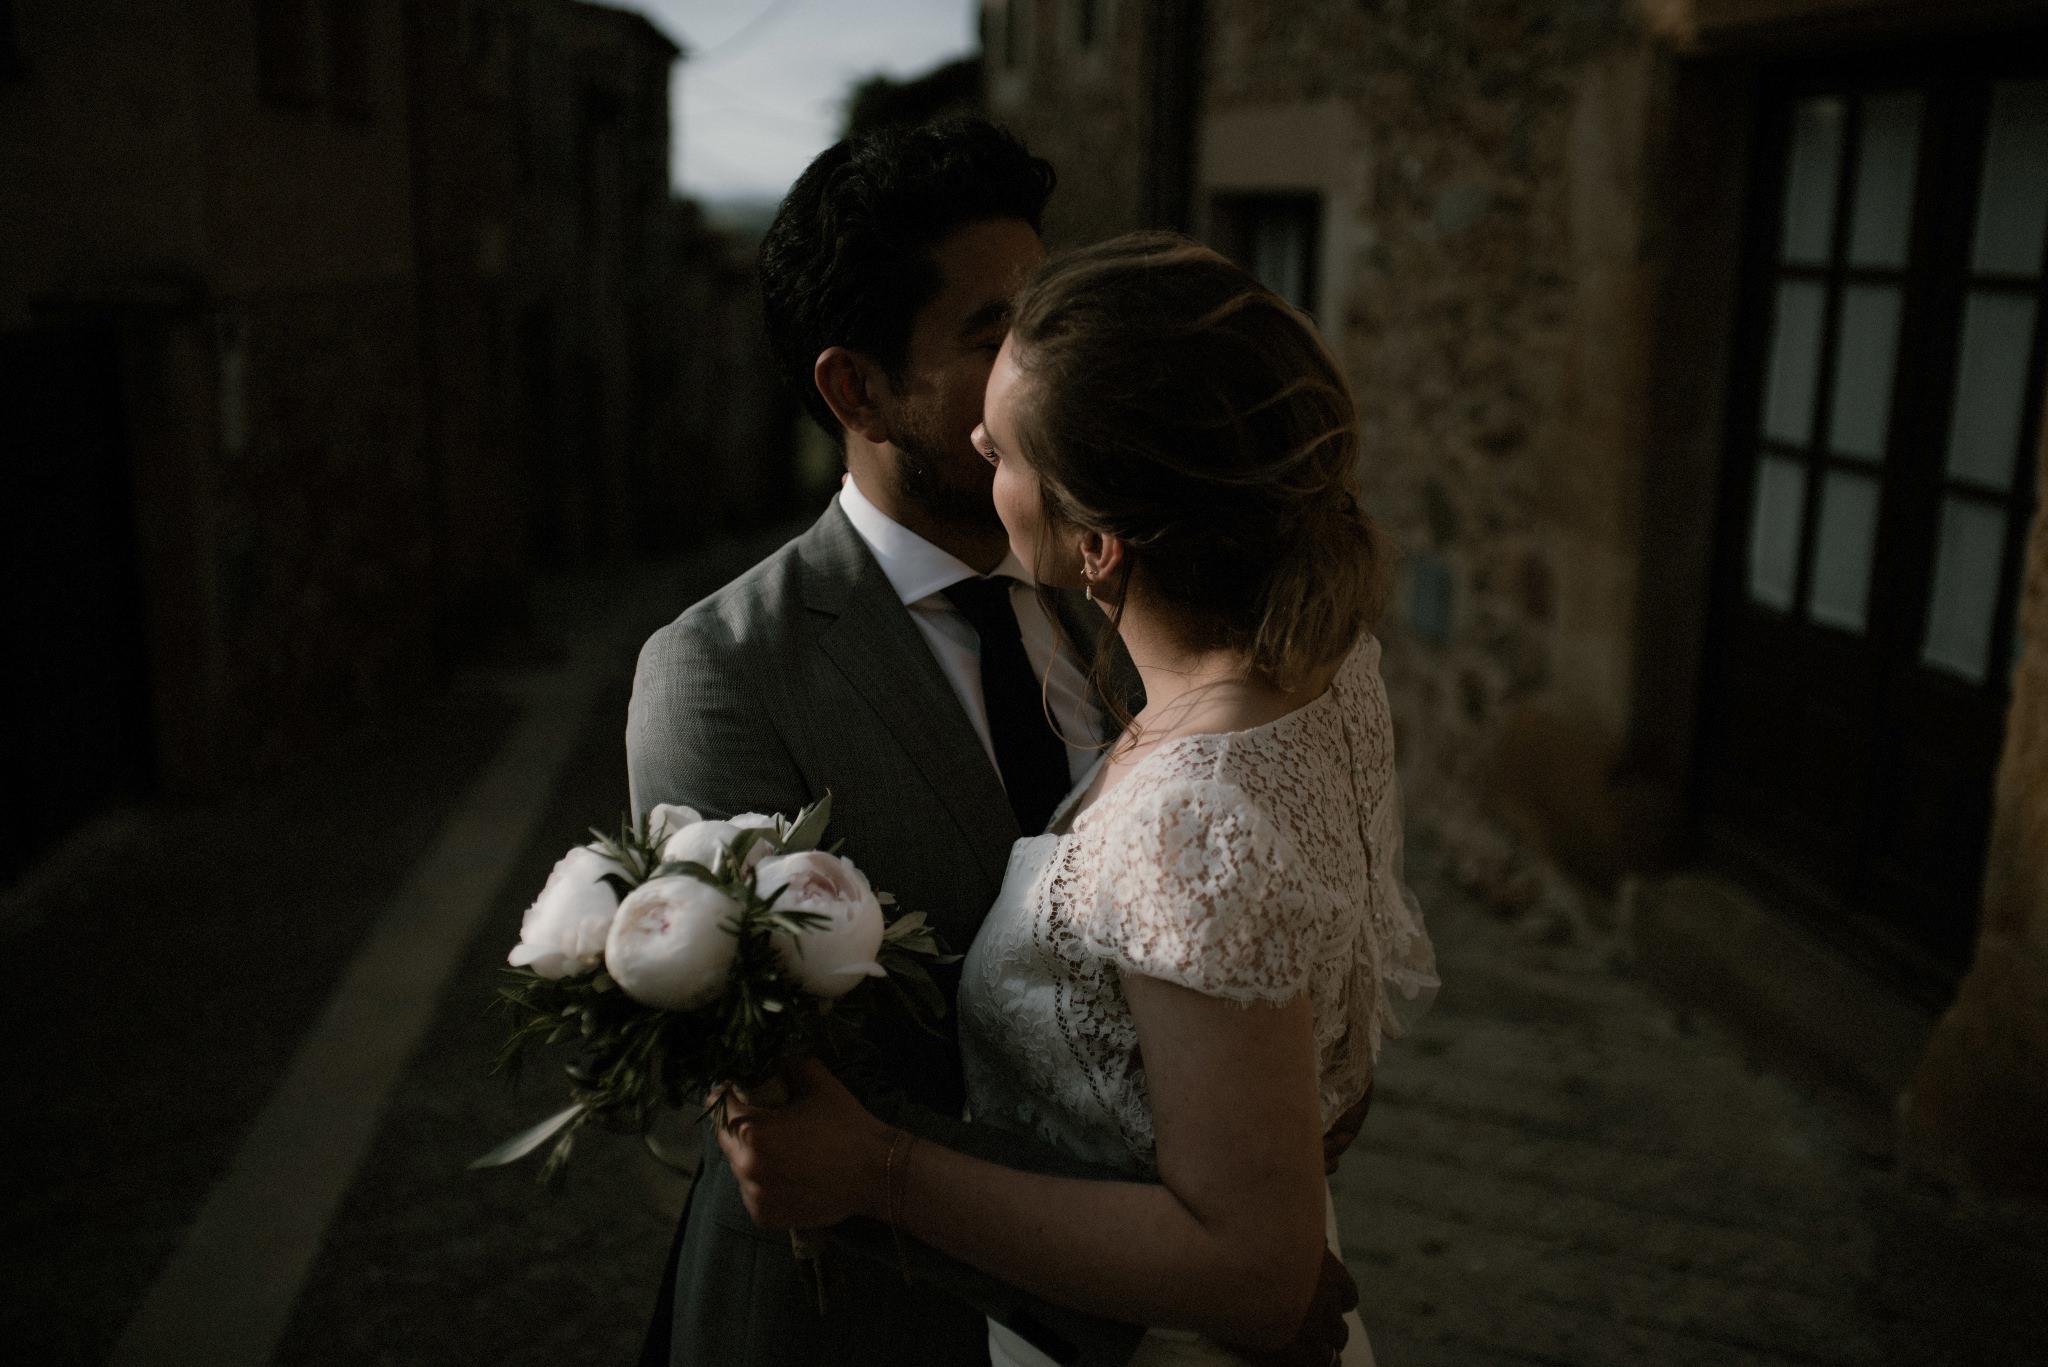 Bruidsfotograaf Spanje Castle d'Emporda destination wedding Naomi van der Kraan00055.jpg